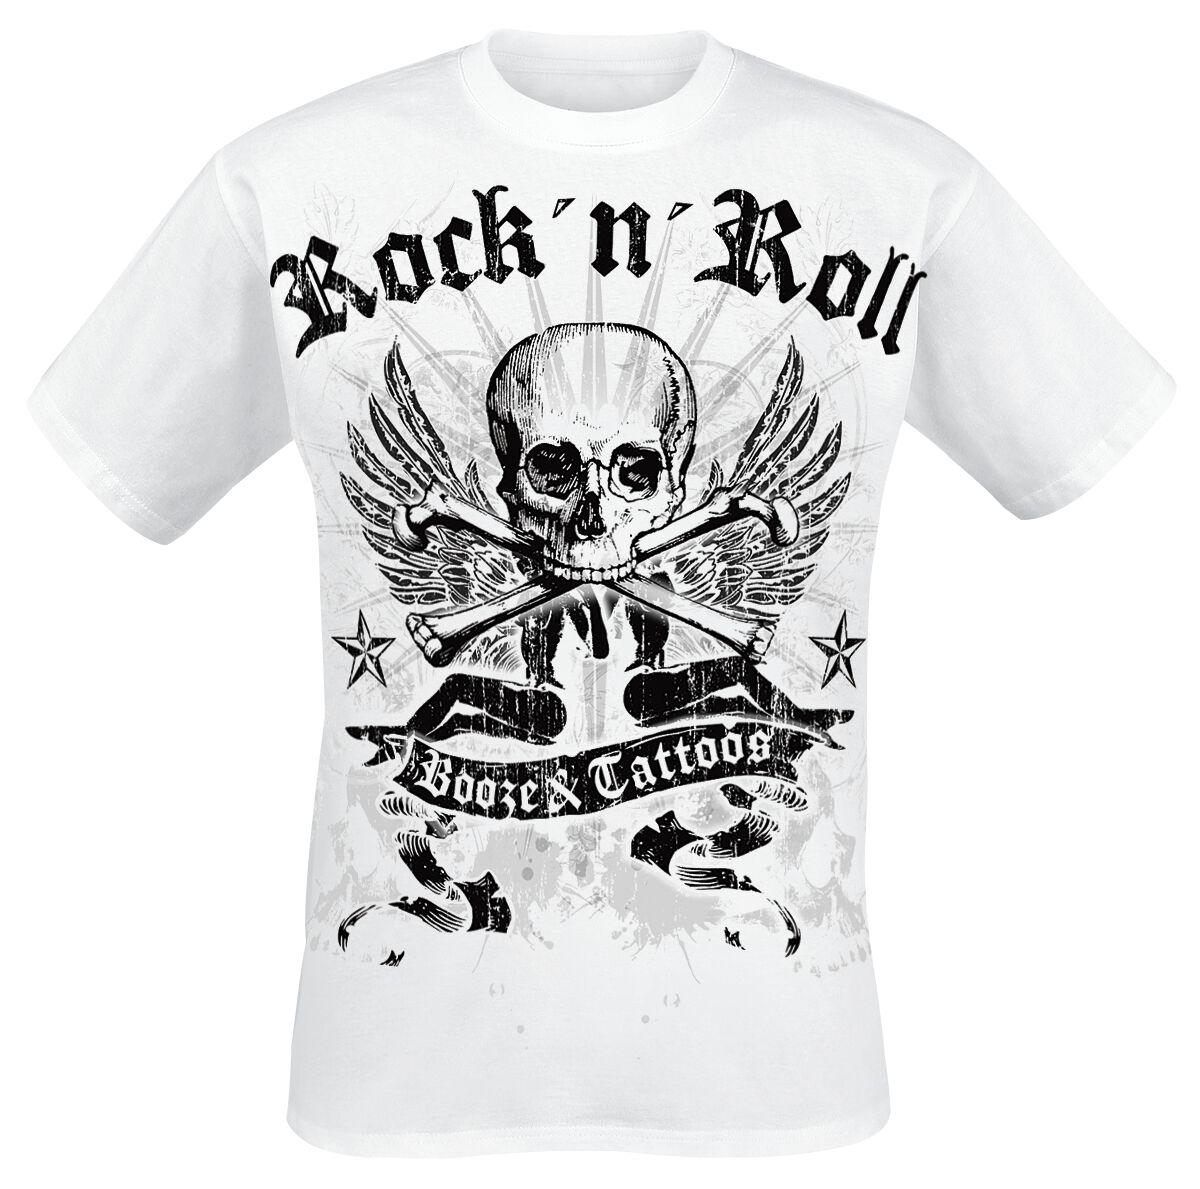 Motyw - Koszulki - T-Shirt Booze & Tattoos T-Shirt biały - 239458